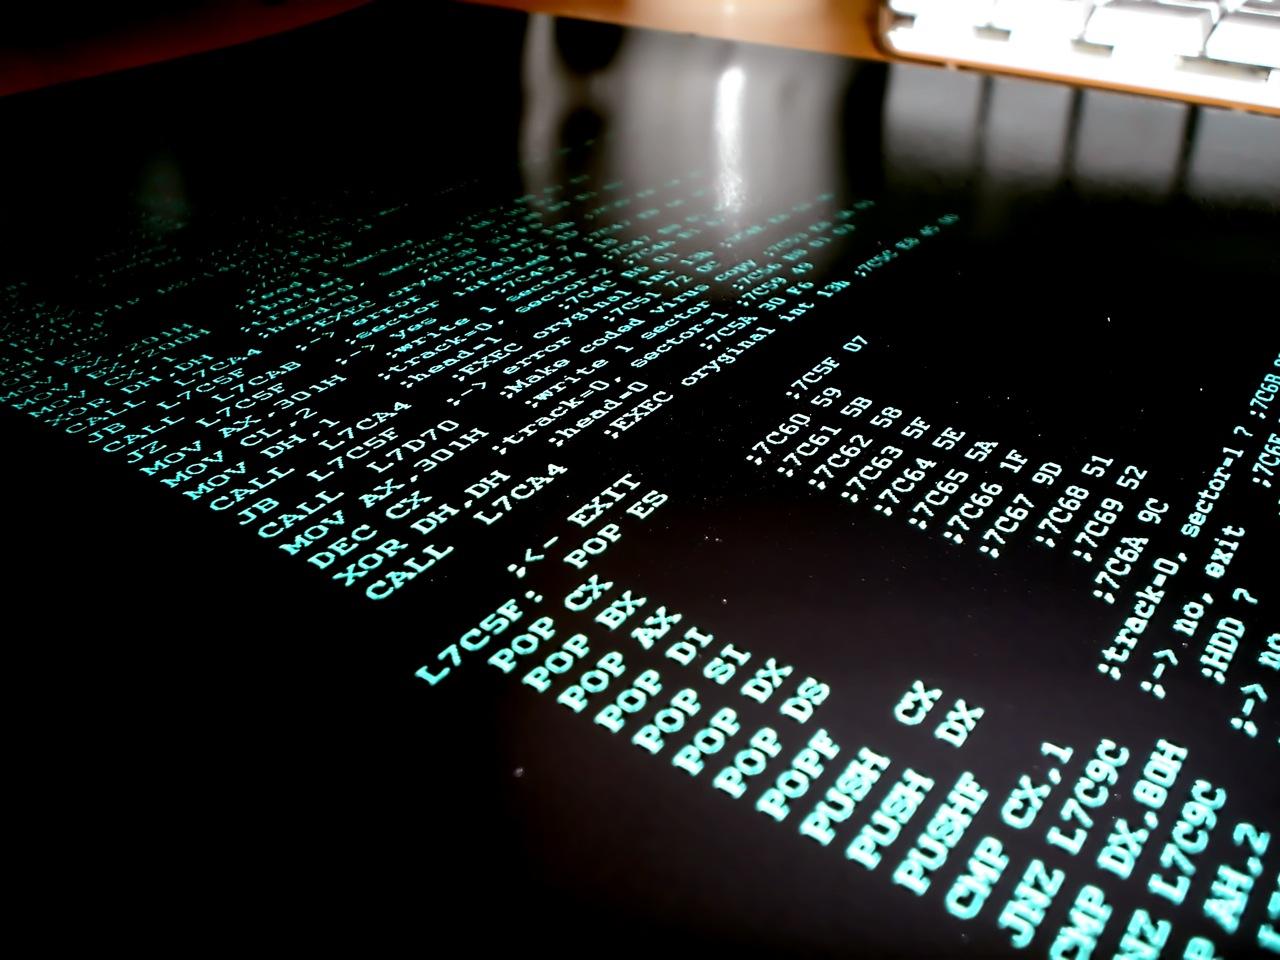 Computer Virus - hj barraza - CC2.0 Attribution Sharalike